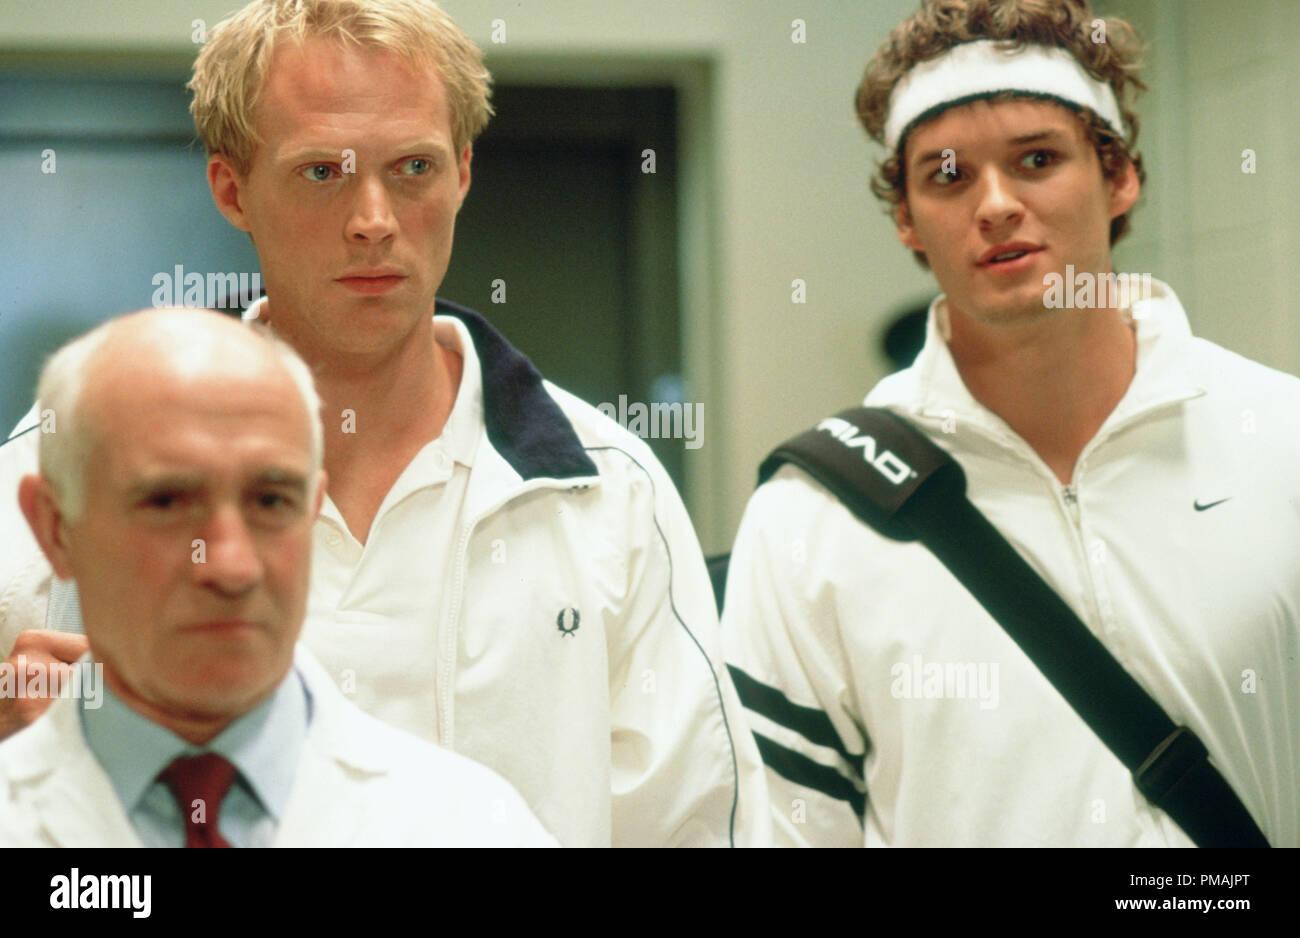 (L a r) contendiente británico Peter Colt (Paul Bettany) y campeón americano Jake Hammond (AUSTIN NICHOLS) es llevado a la famosa pista central de Working Title Films' comedia romántica Wimbledon. (2004) Foto de stock